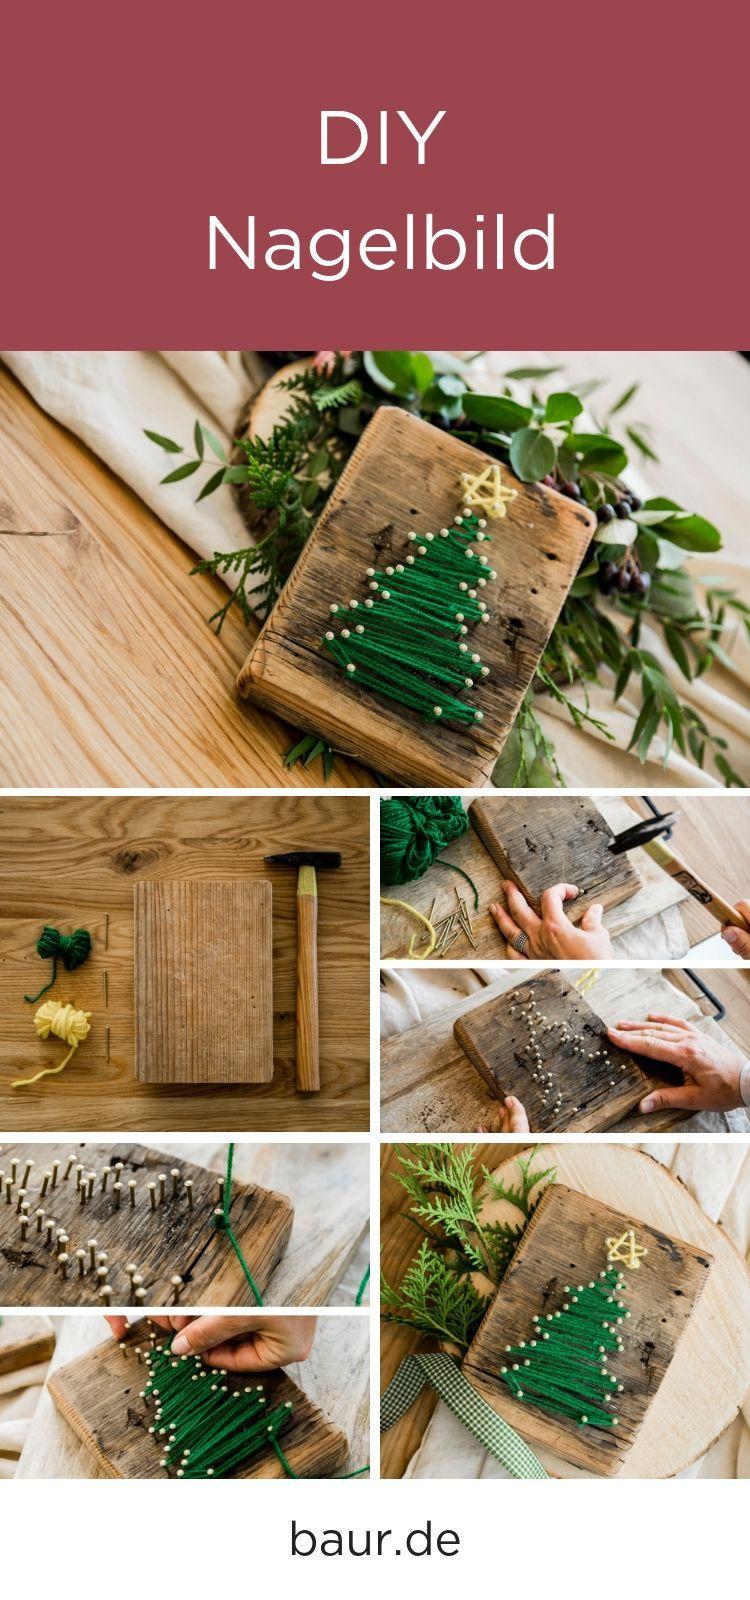 Photo of Fai da te: albero di Natale per unghie, decorazioni natalizie … – Albero di Natale # decorazioni #Diy #Nail picture …